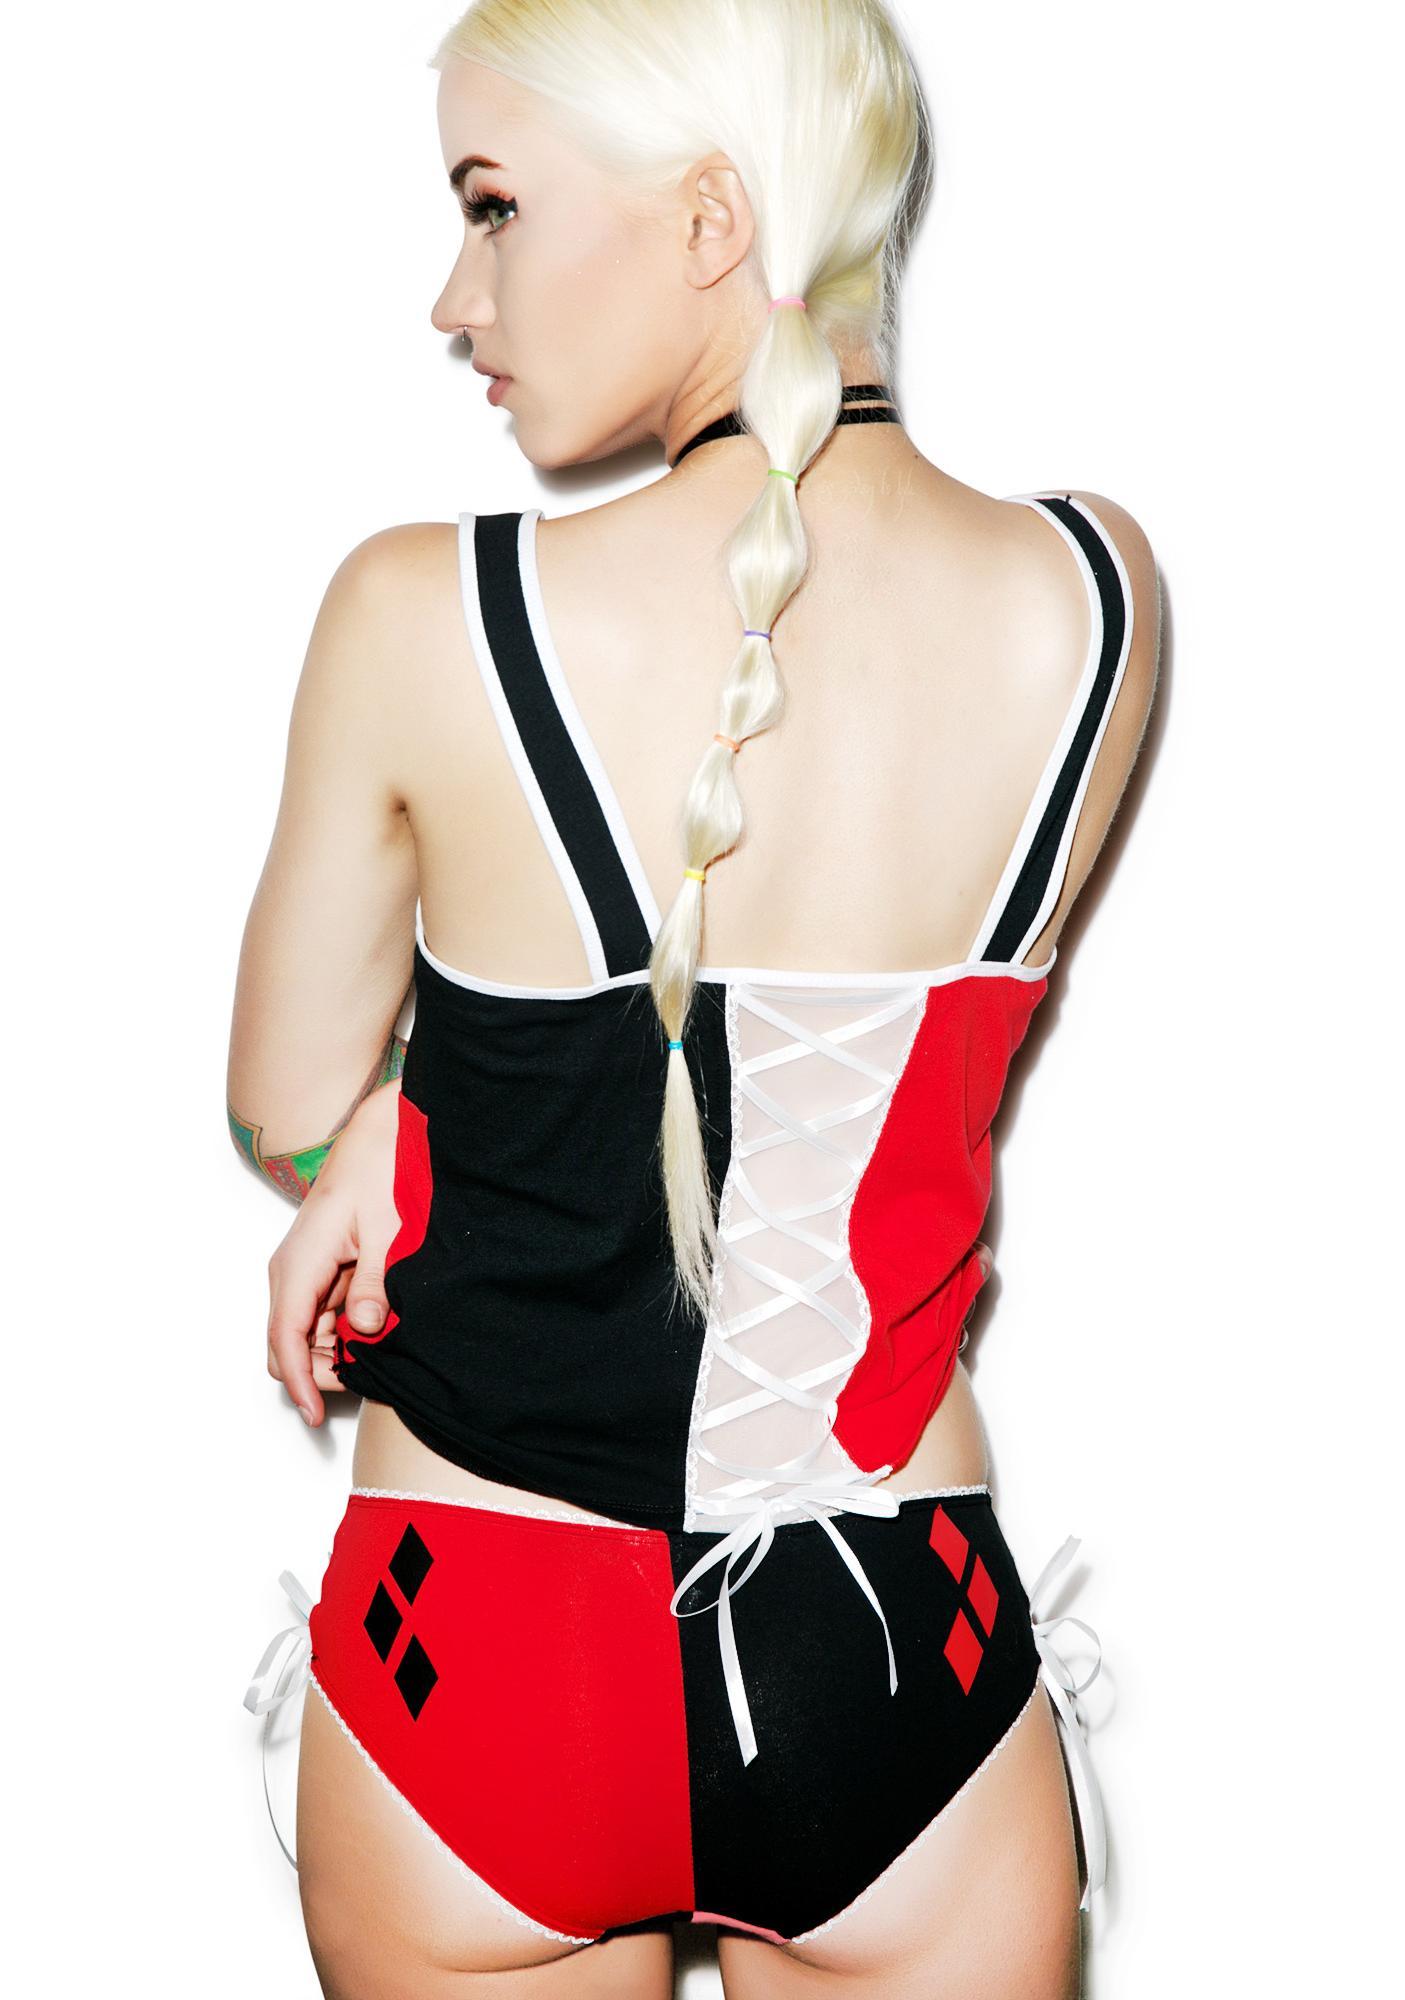 Undergirl Harley Quinn Lace Back Set